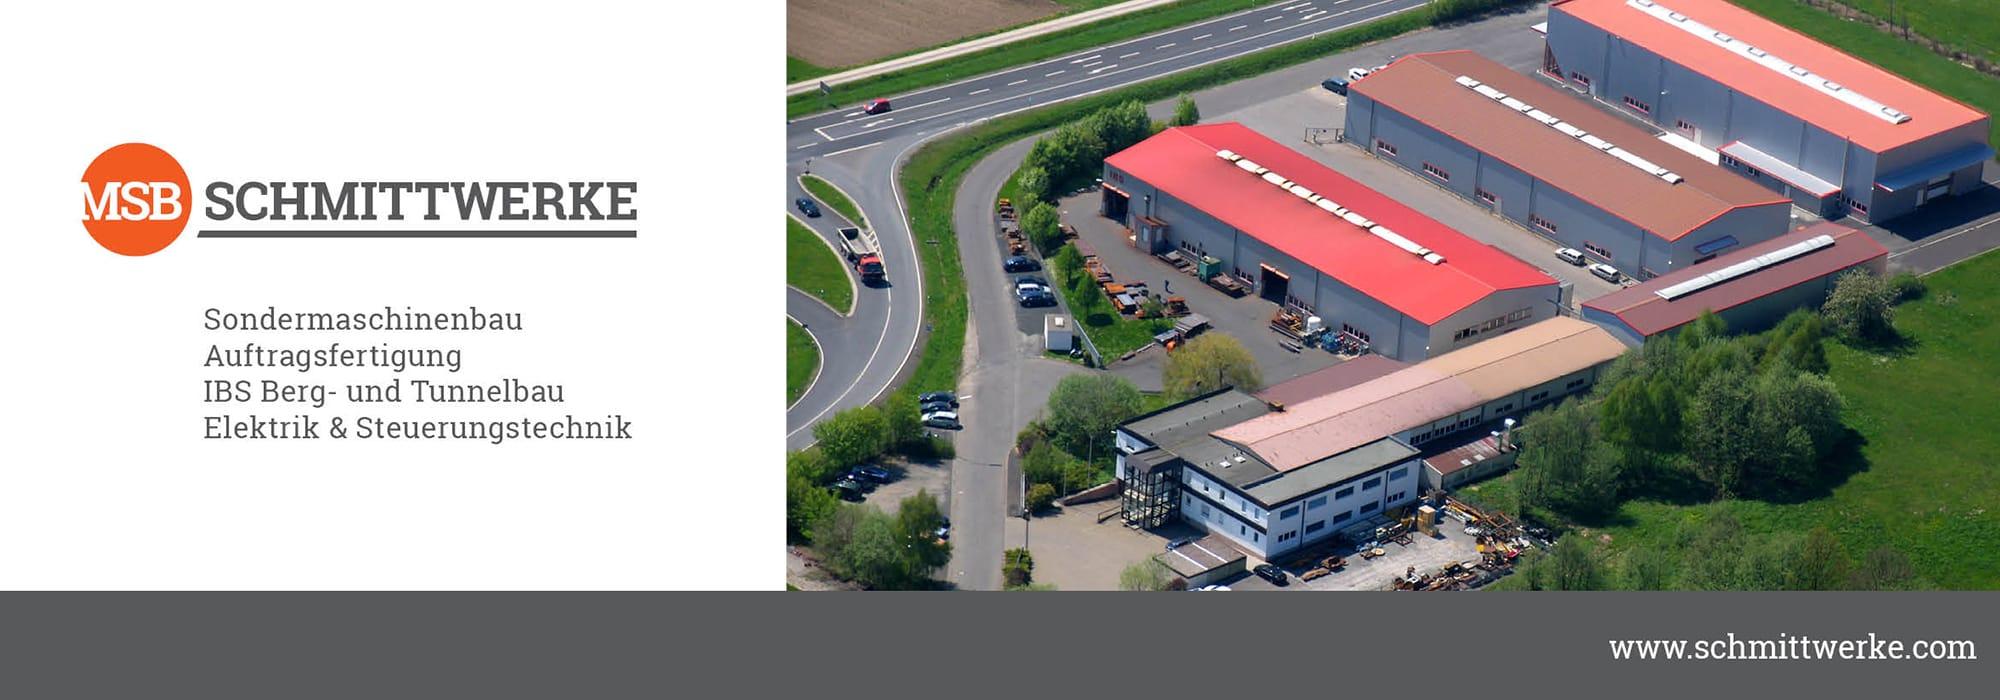 MSB GmbH & Co. KG (MSB Schmittwerke)